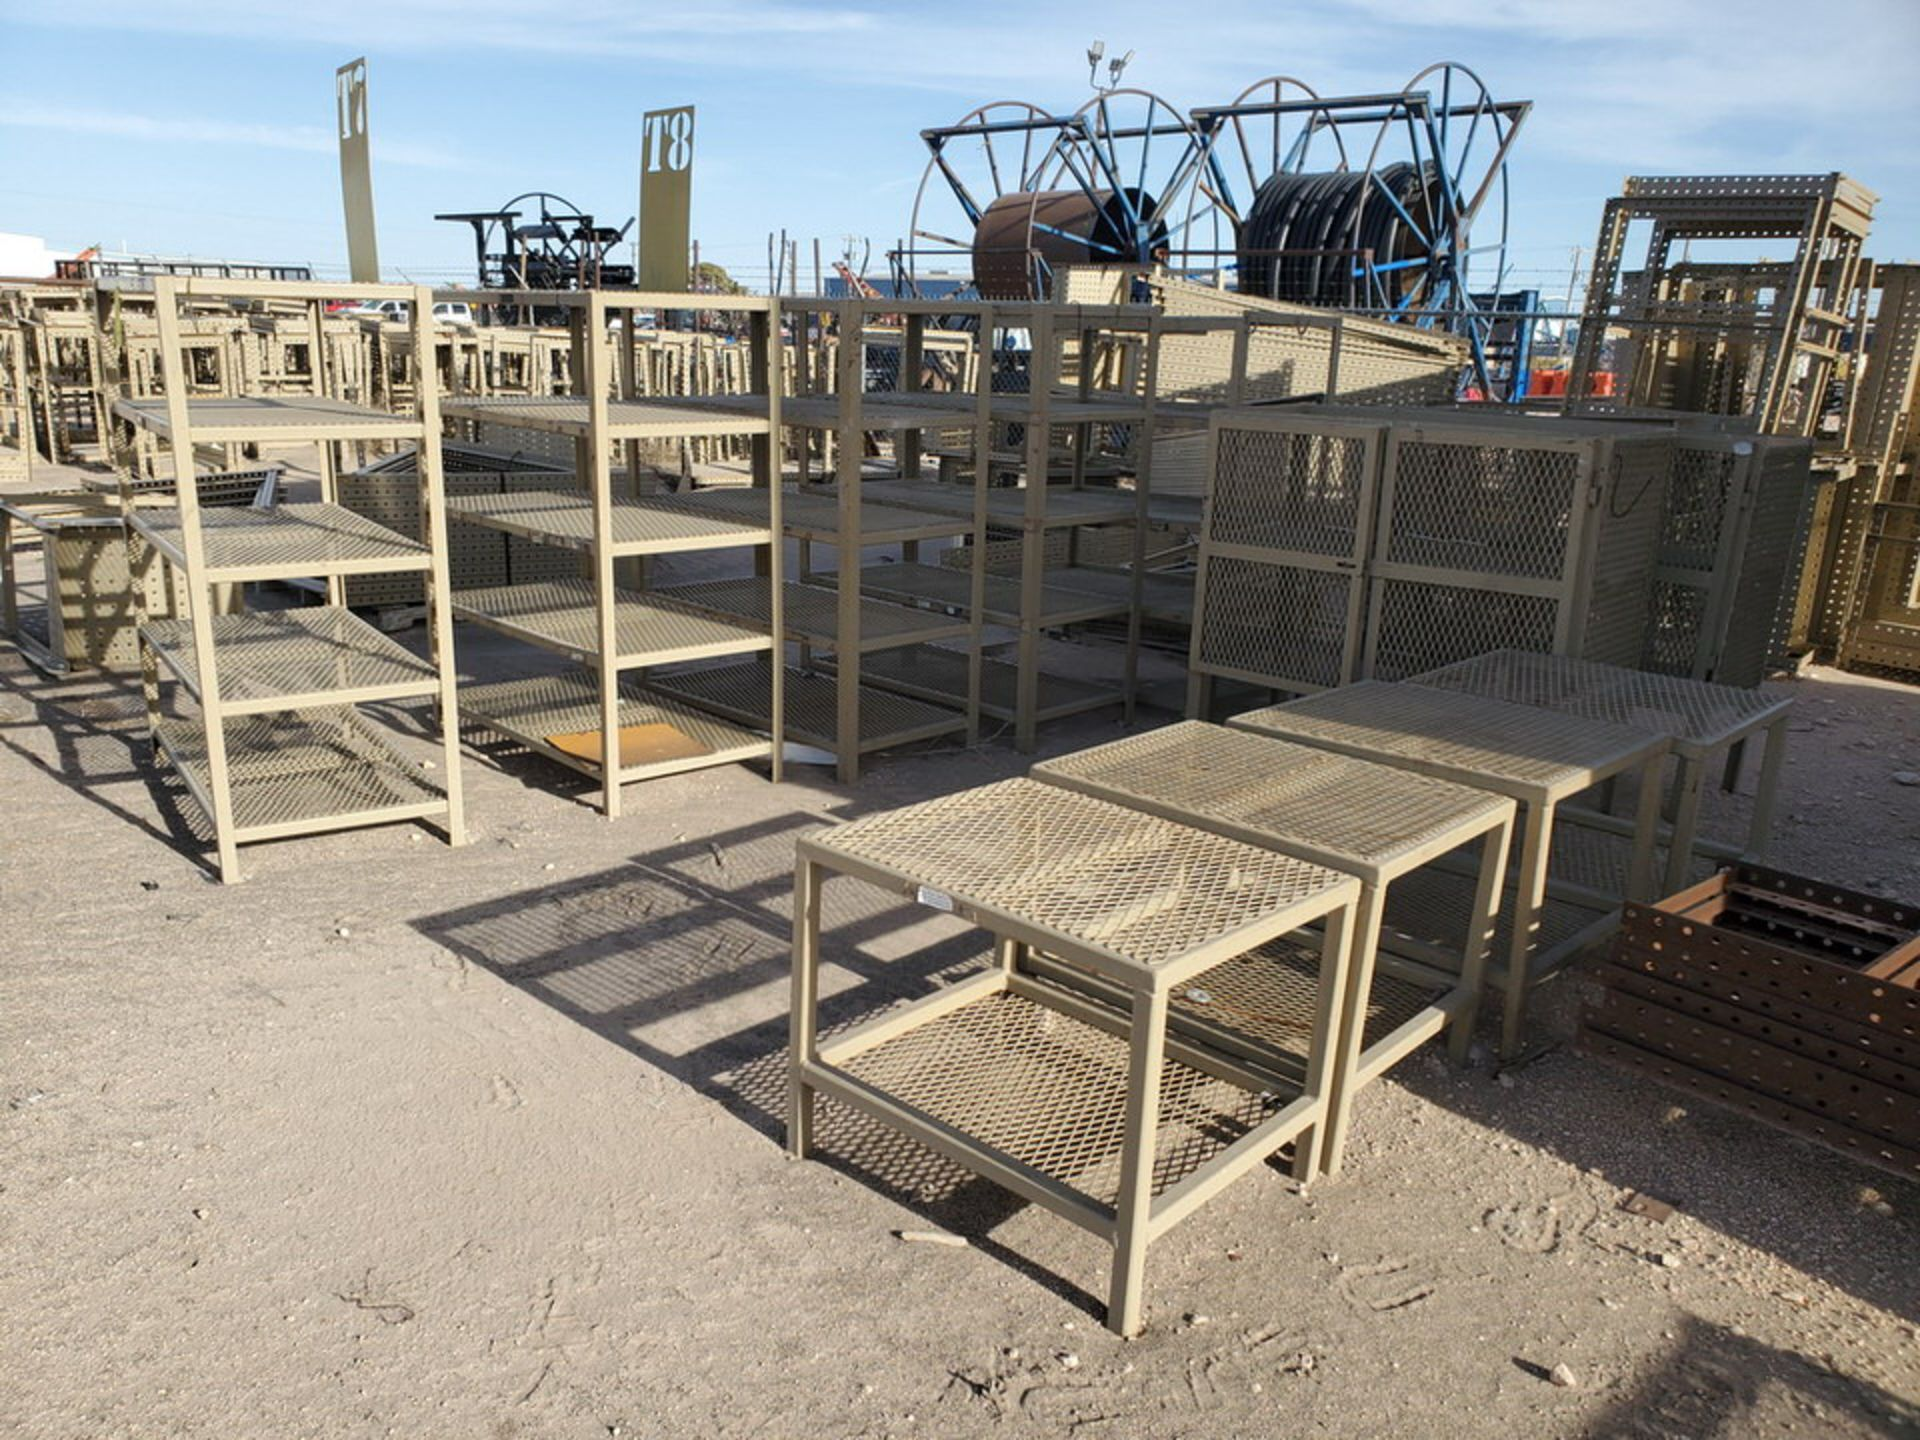 "Assorted Stl Matl. Racks & Ladders Size Range: 30"" x 26"" x 25""H - 29"" x 48"" x 50""H - Image 11 of 18"